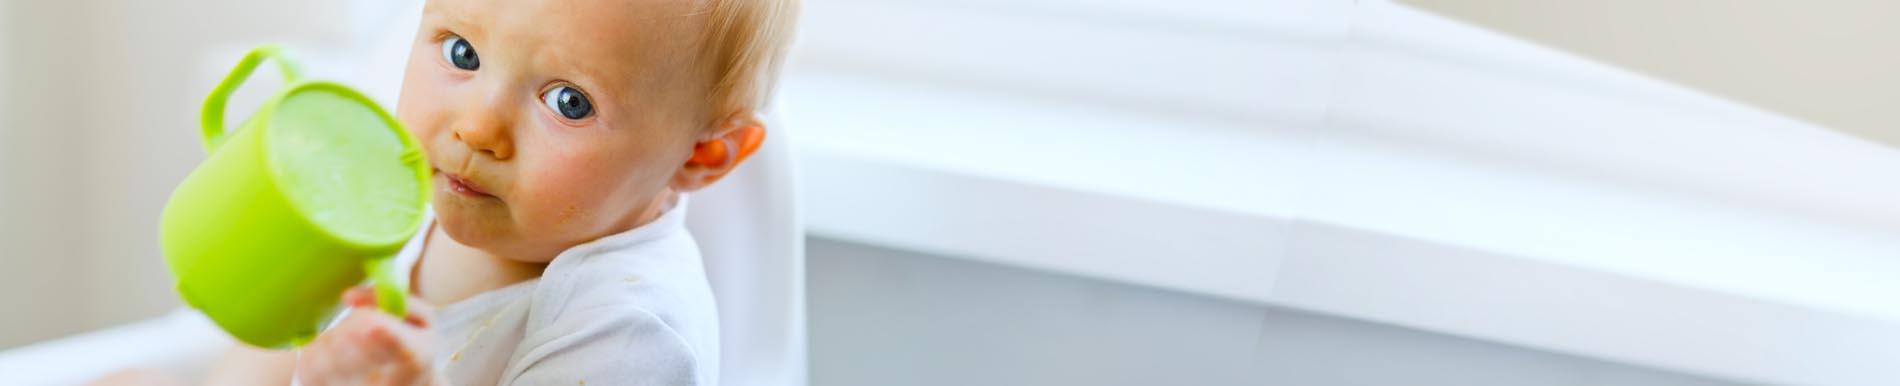 https://www.healthychildren.org/SiteCollectionImage-Homepage-Banners/juice_sippy_header.jpg